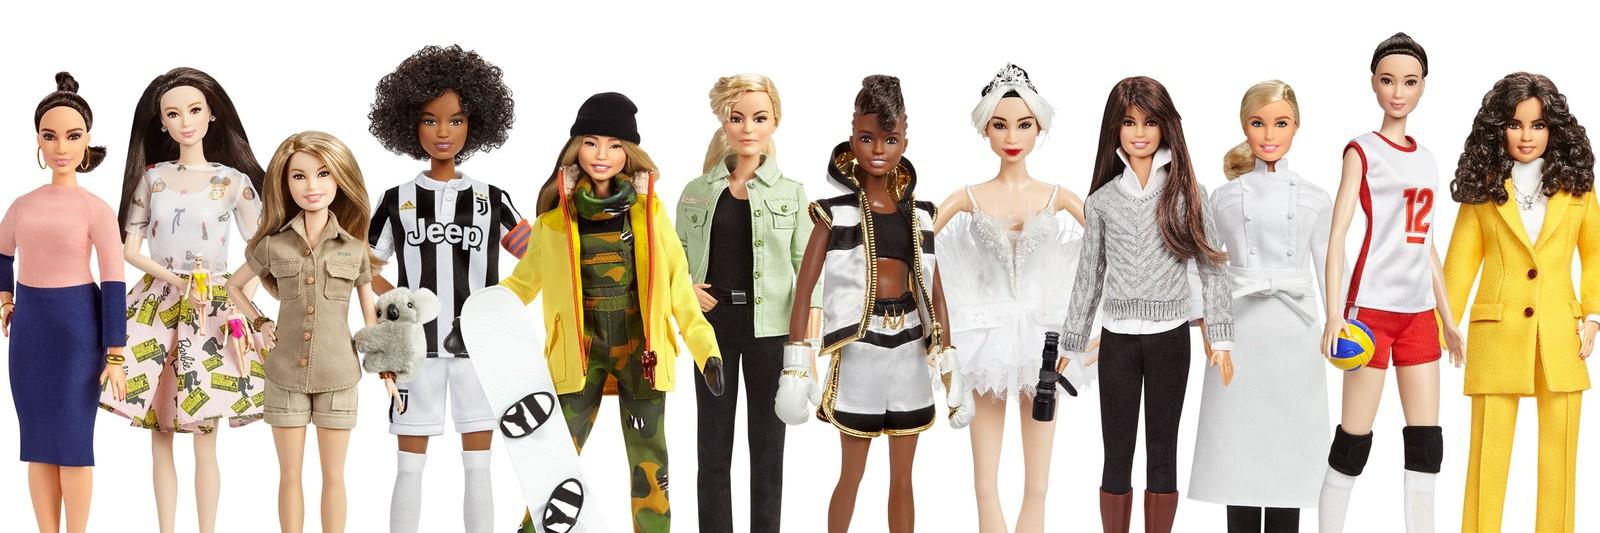 Barbies do projeto Shero, da Mattel